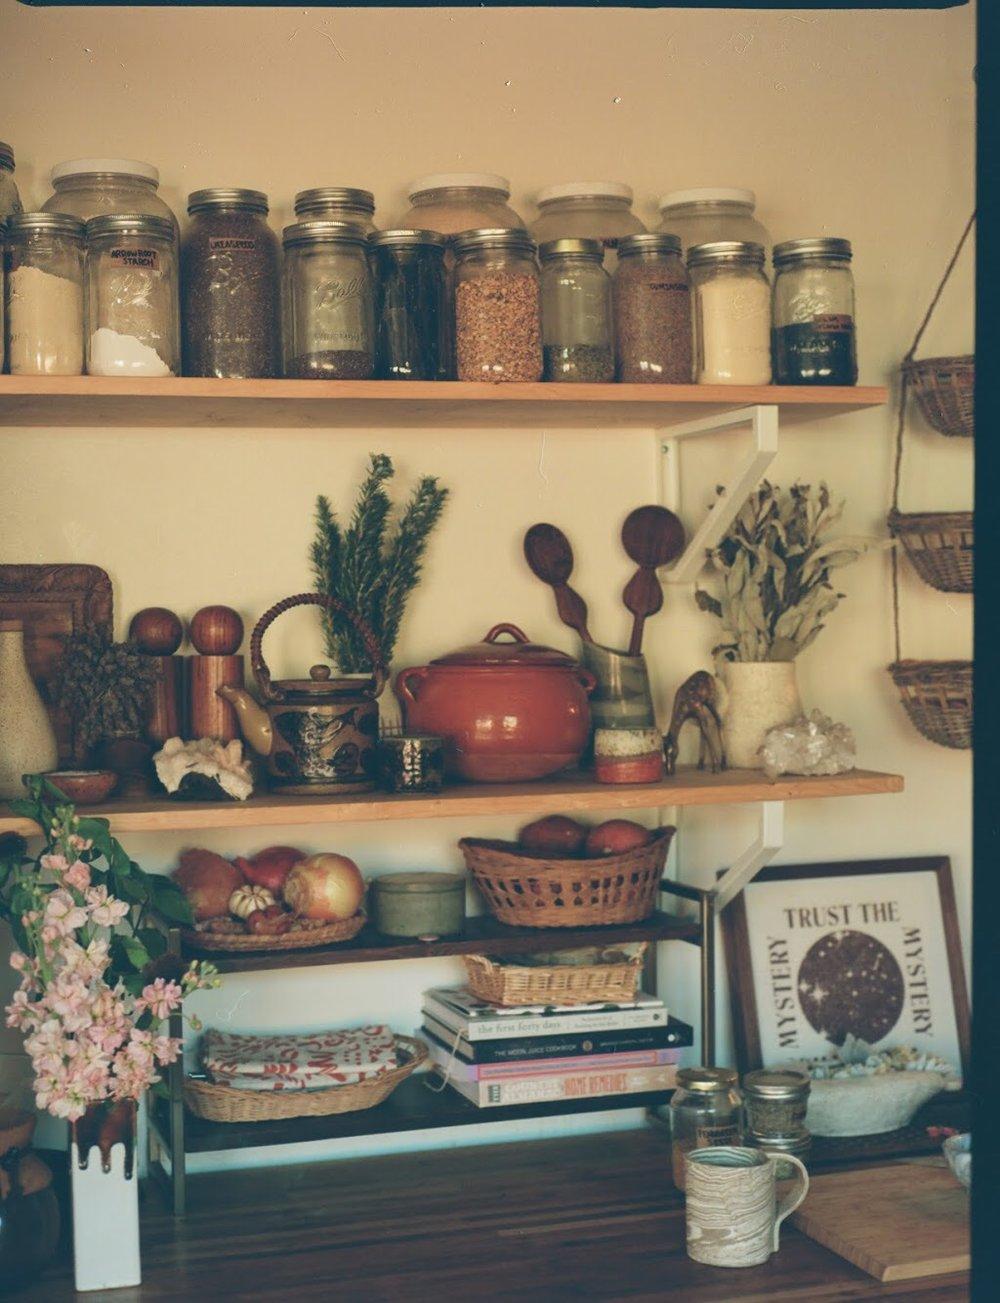 Photo of my kitchen by Sam Stenson on 120mm film.